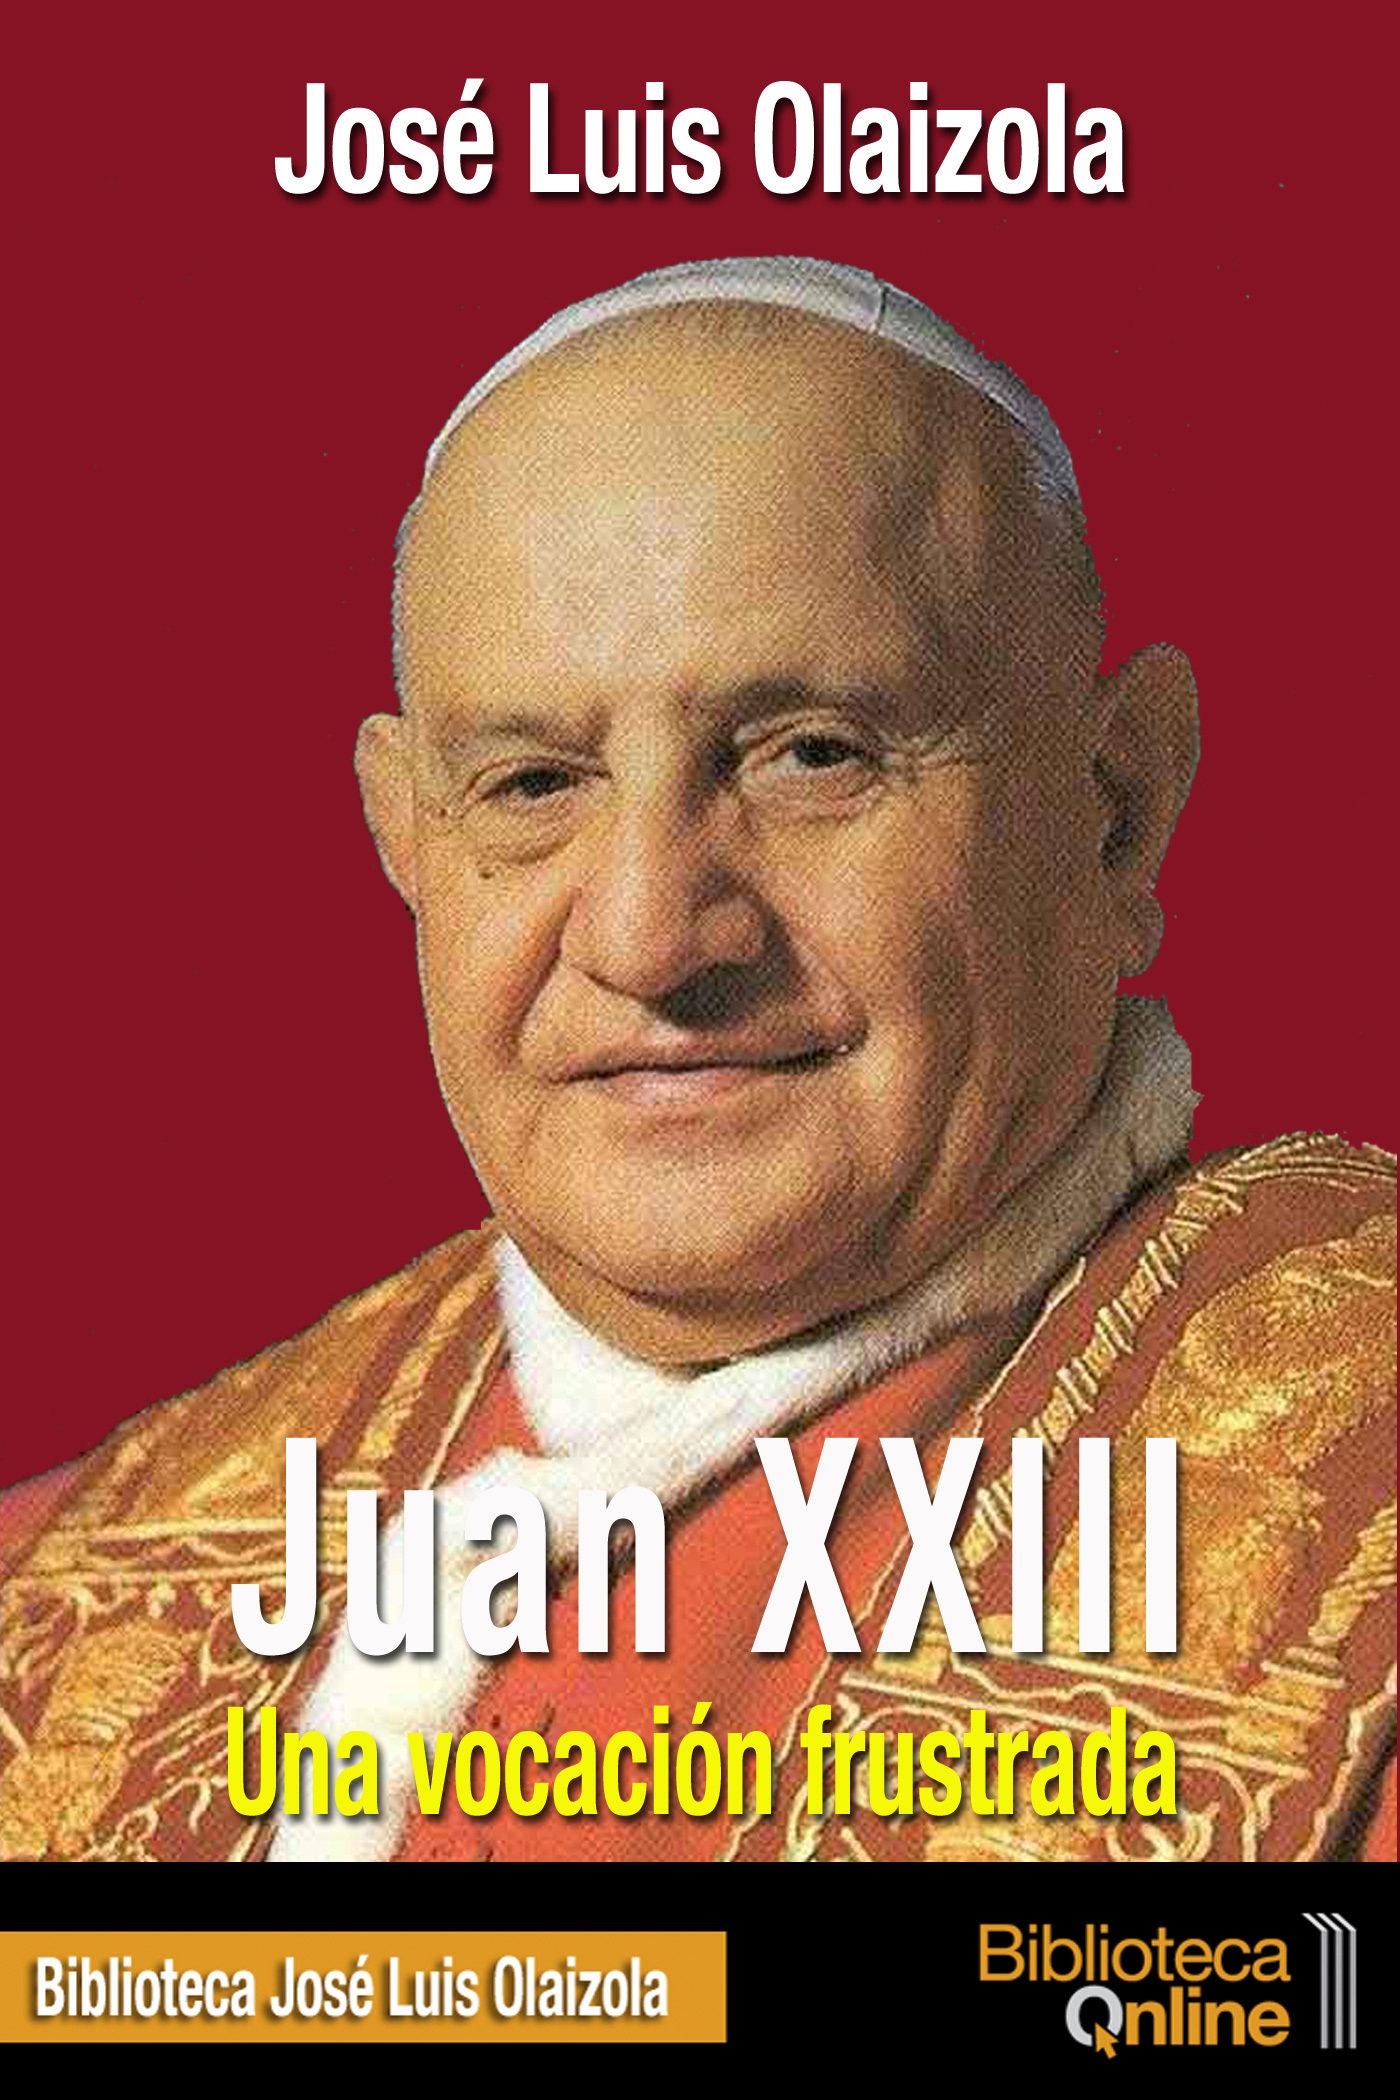 Juan XXIII. Una vocación frustrada J23-JLO